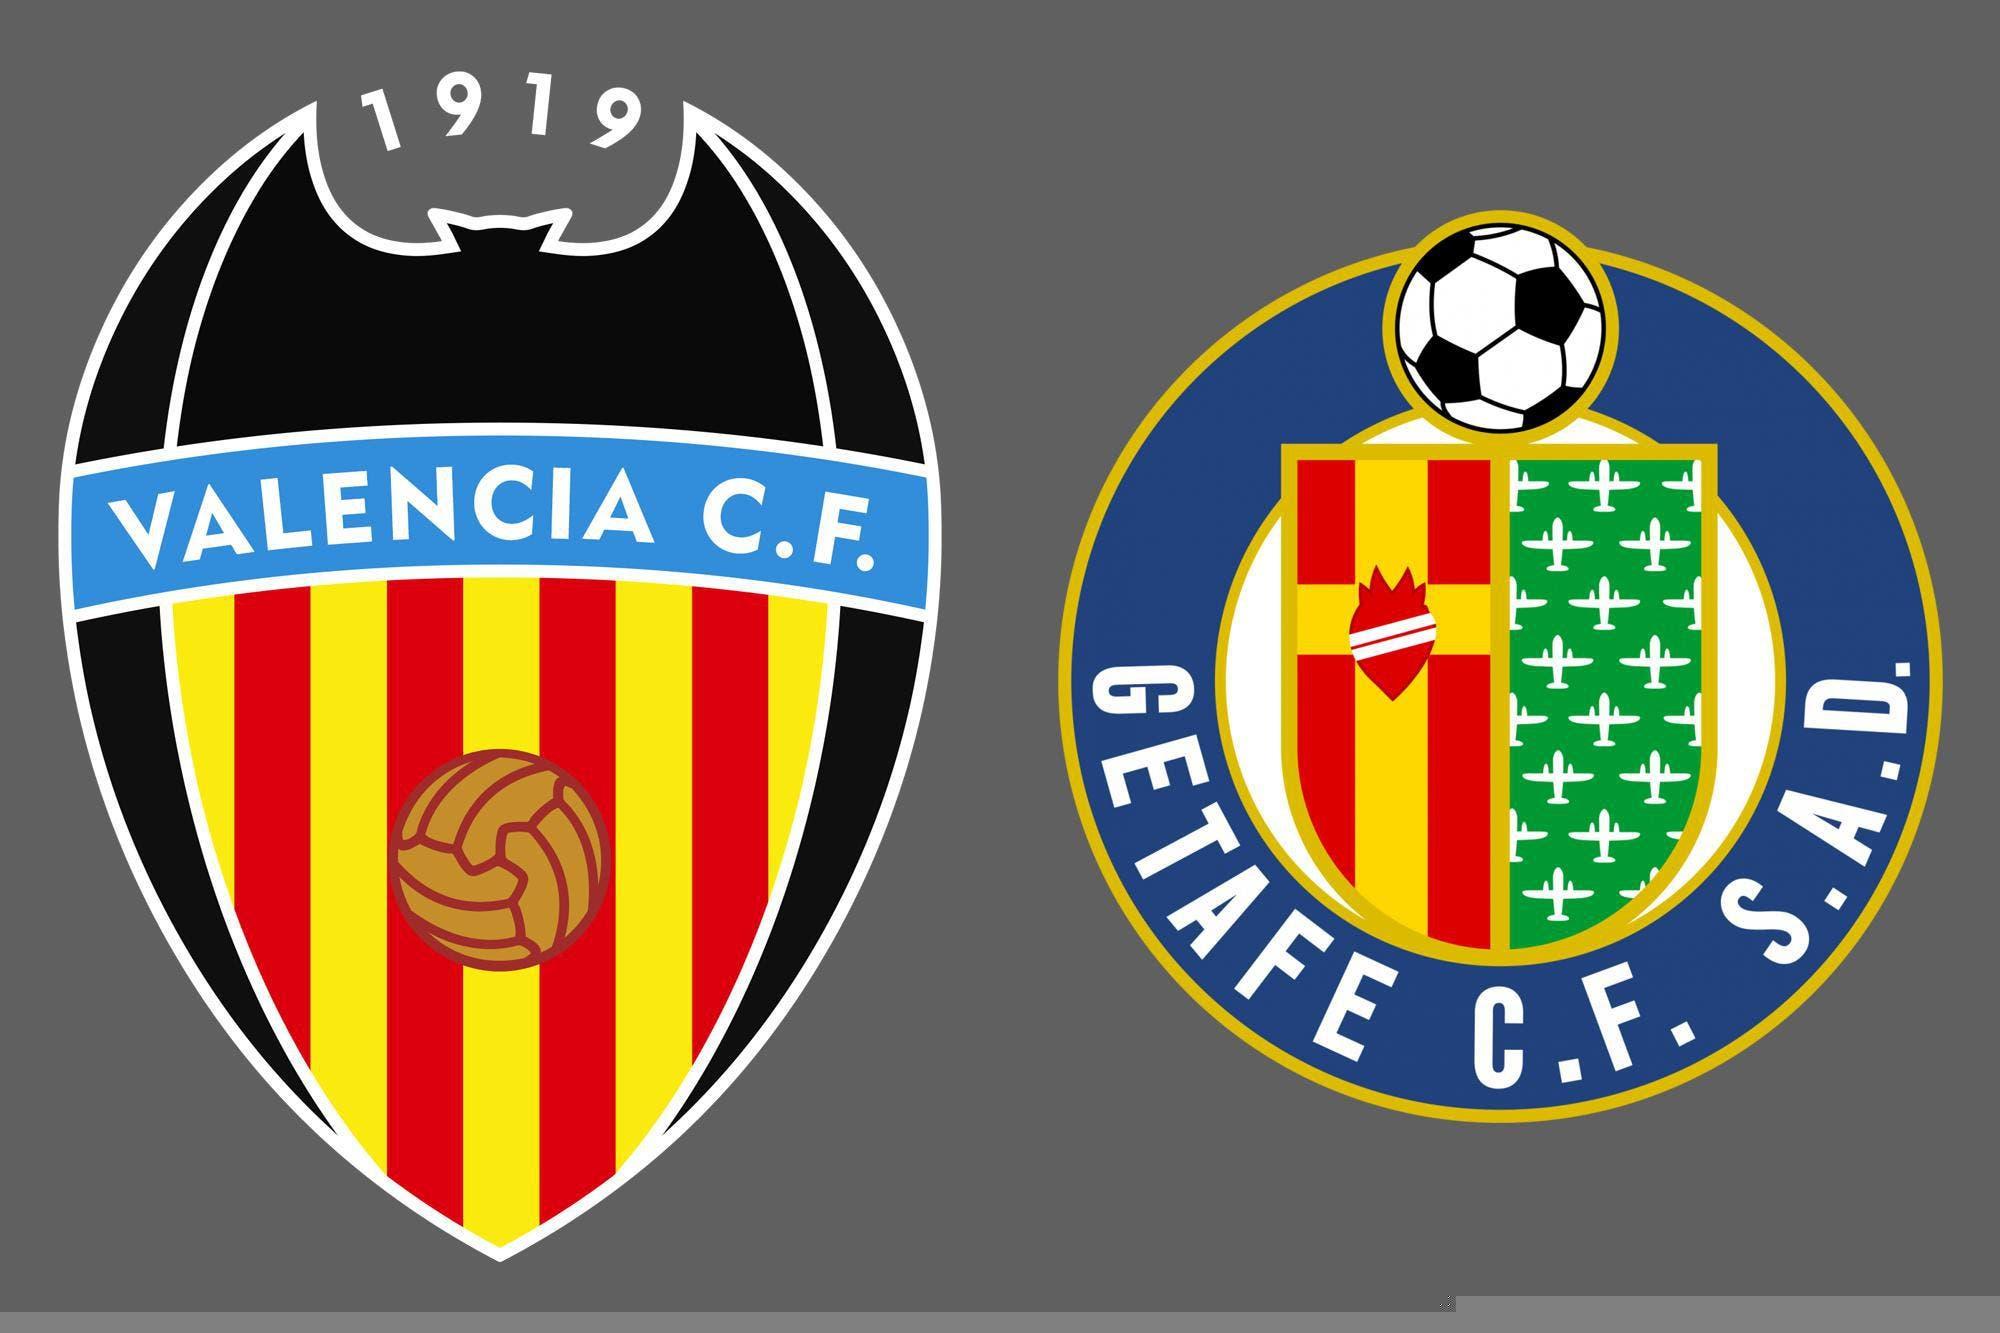 Liga de España: Valencia y Getafe empataron 2-2